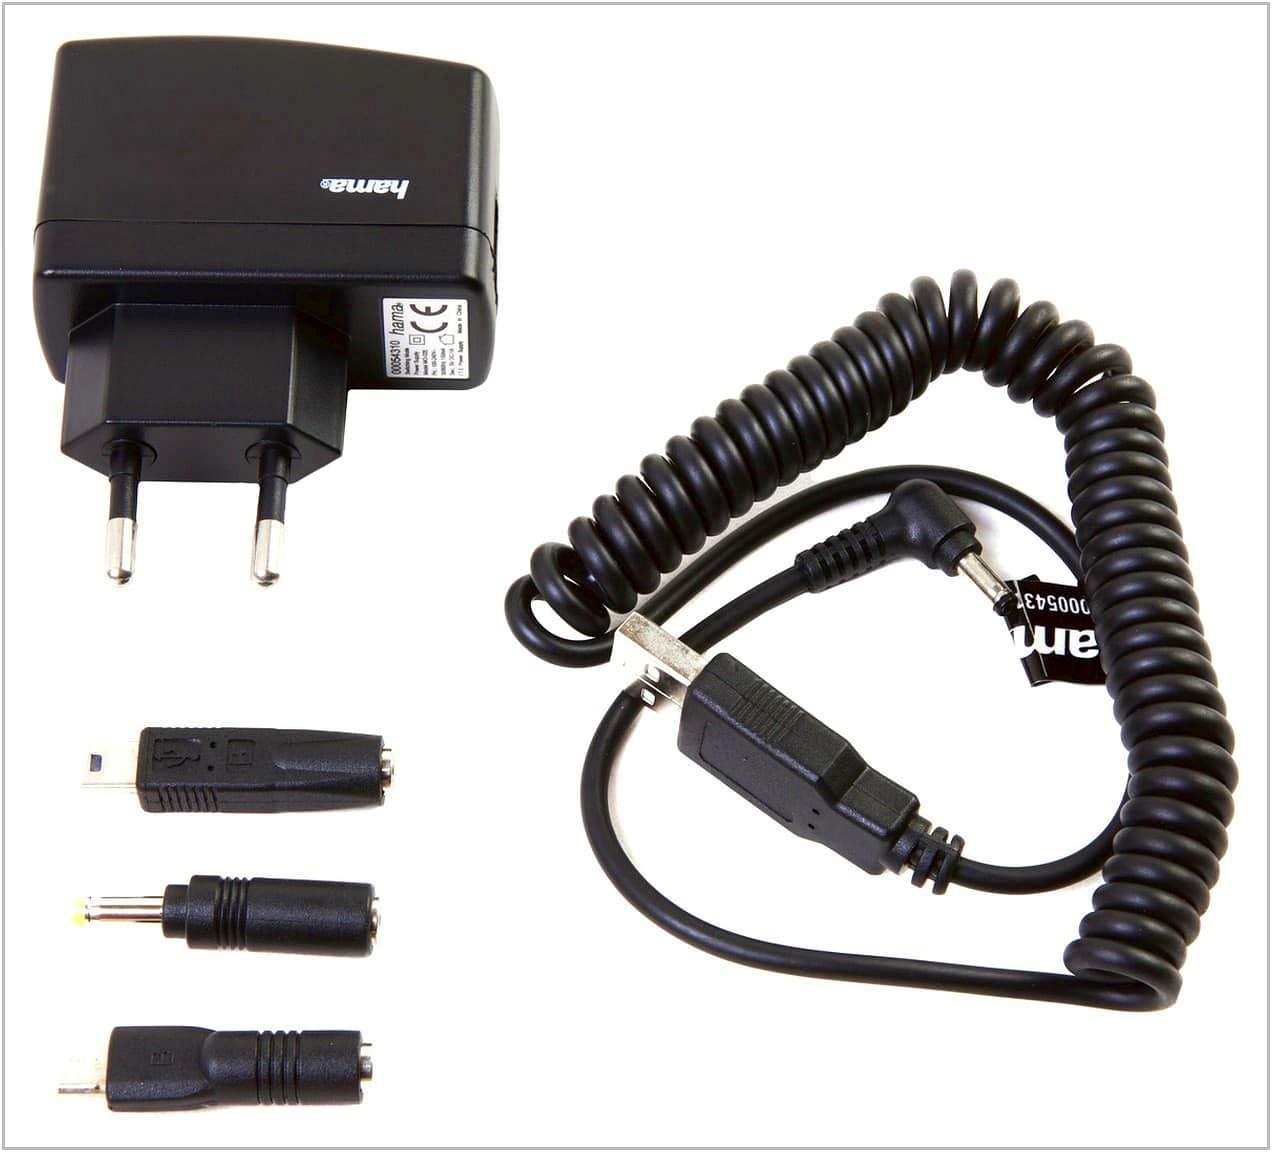 Зарядное устройство для Sony PRS-600 Reader Touch Edition HAMA H-54310